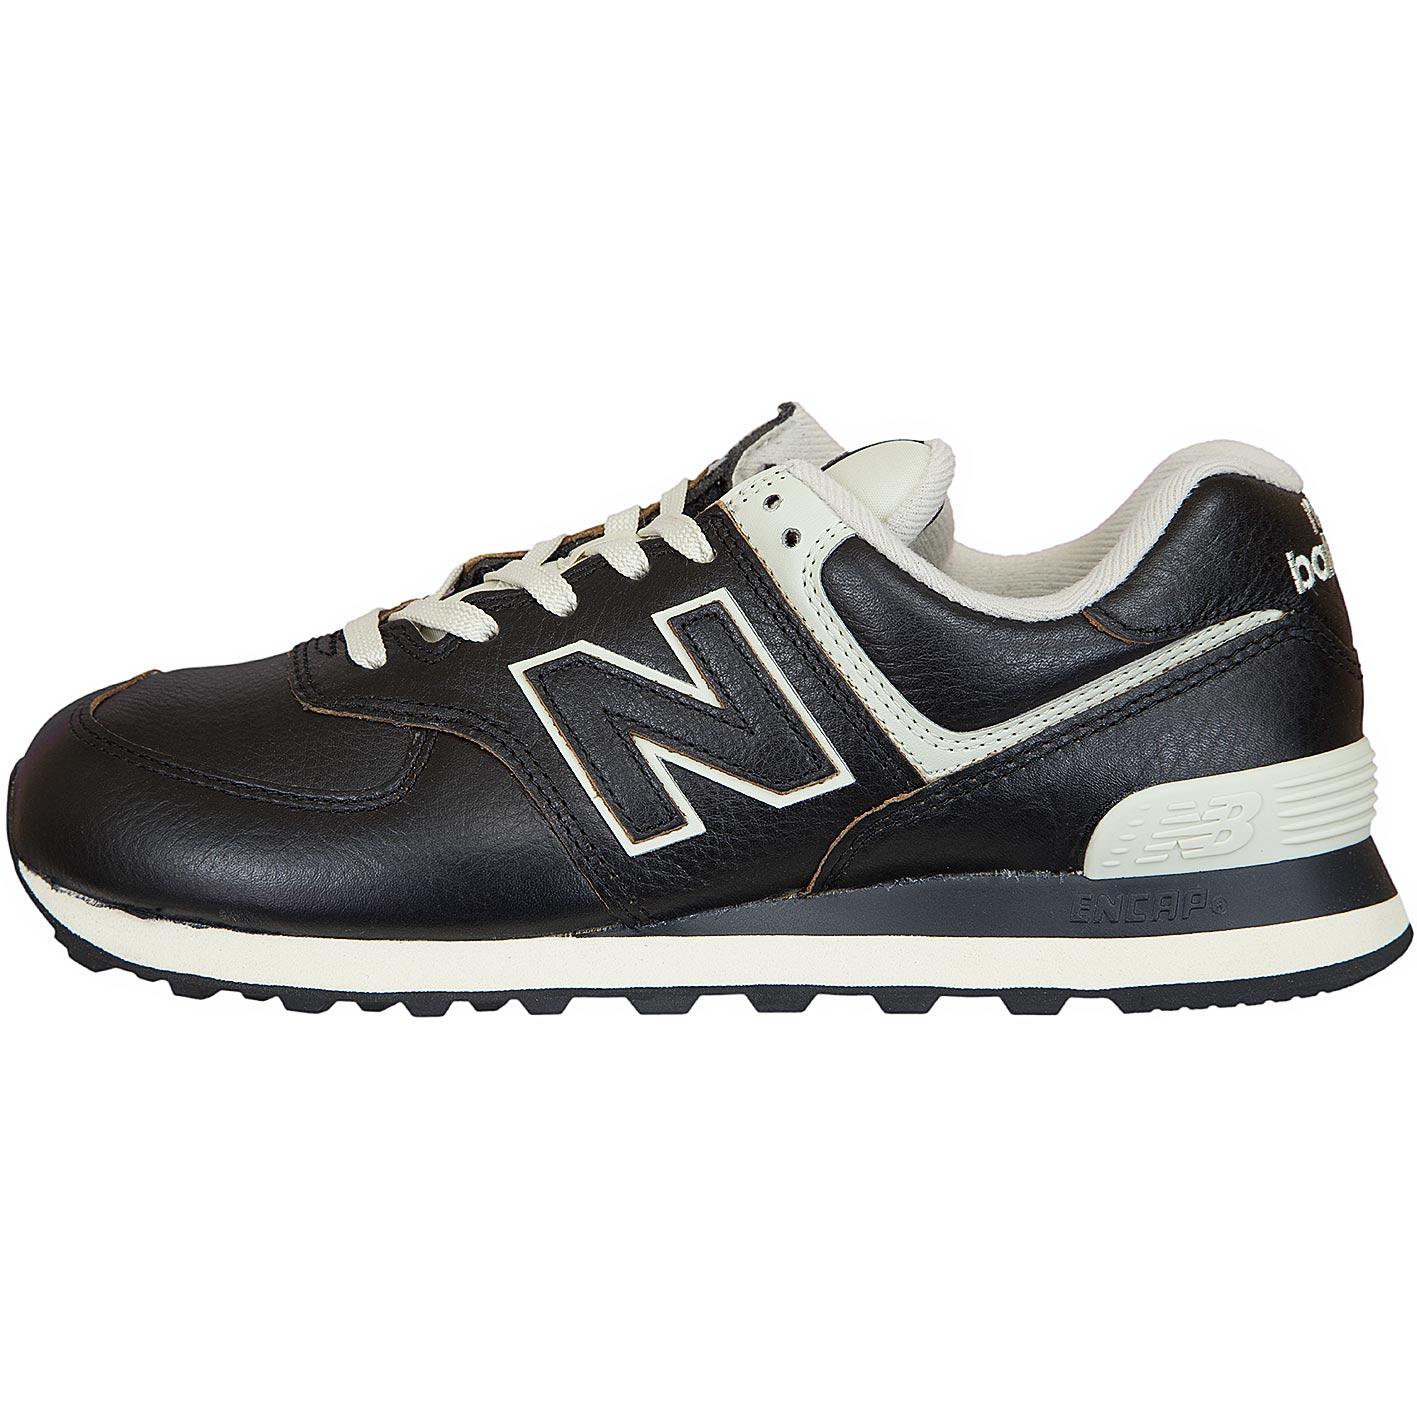 New Balance ML574D 657051 60 8 Schwarz